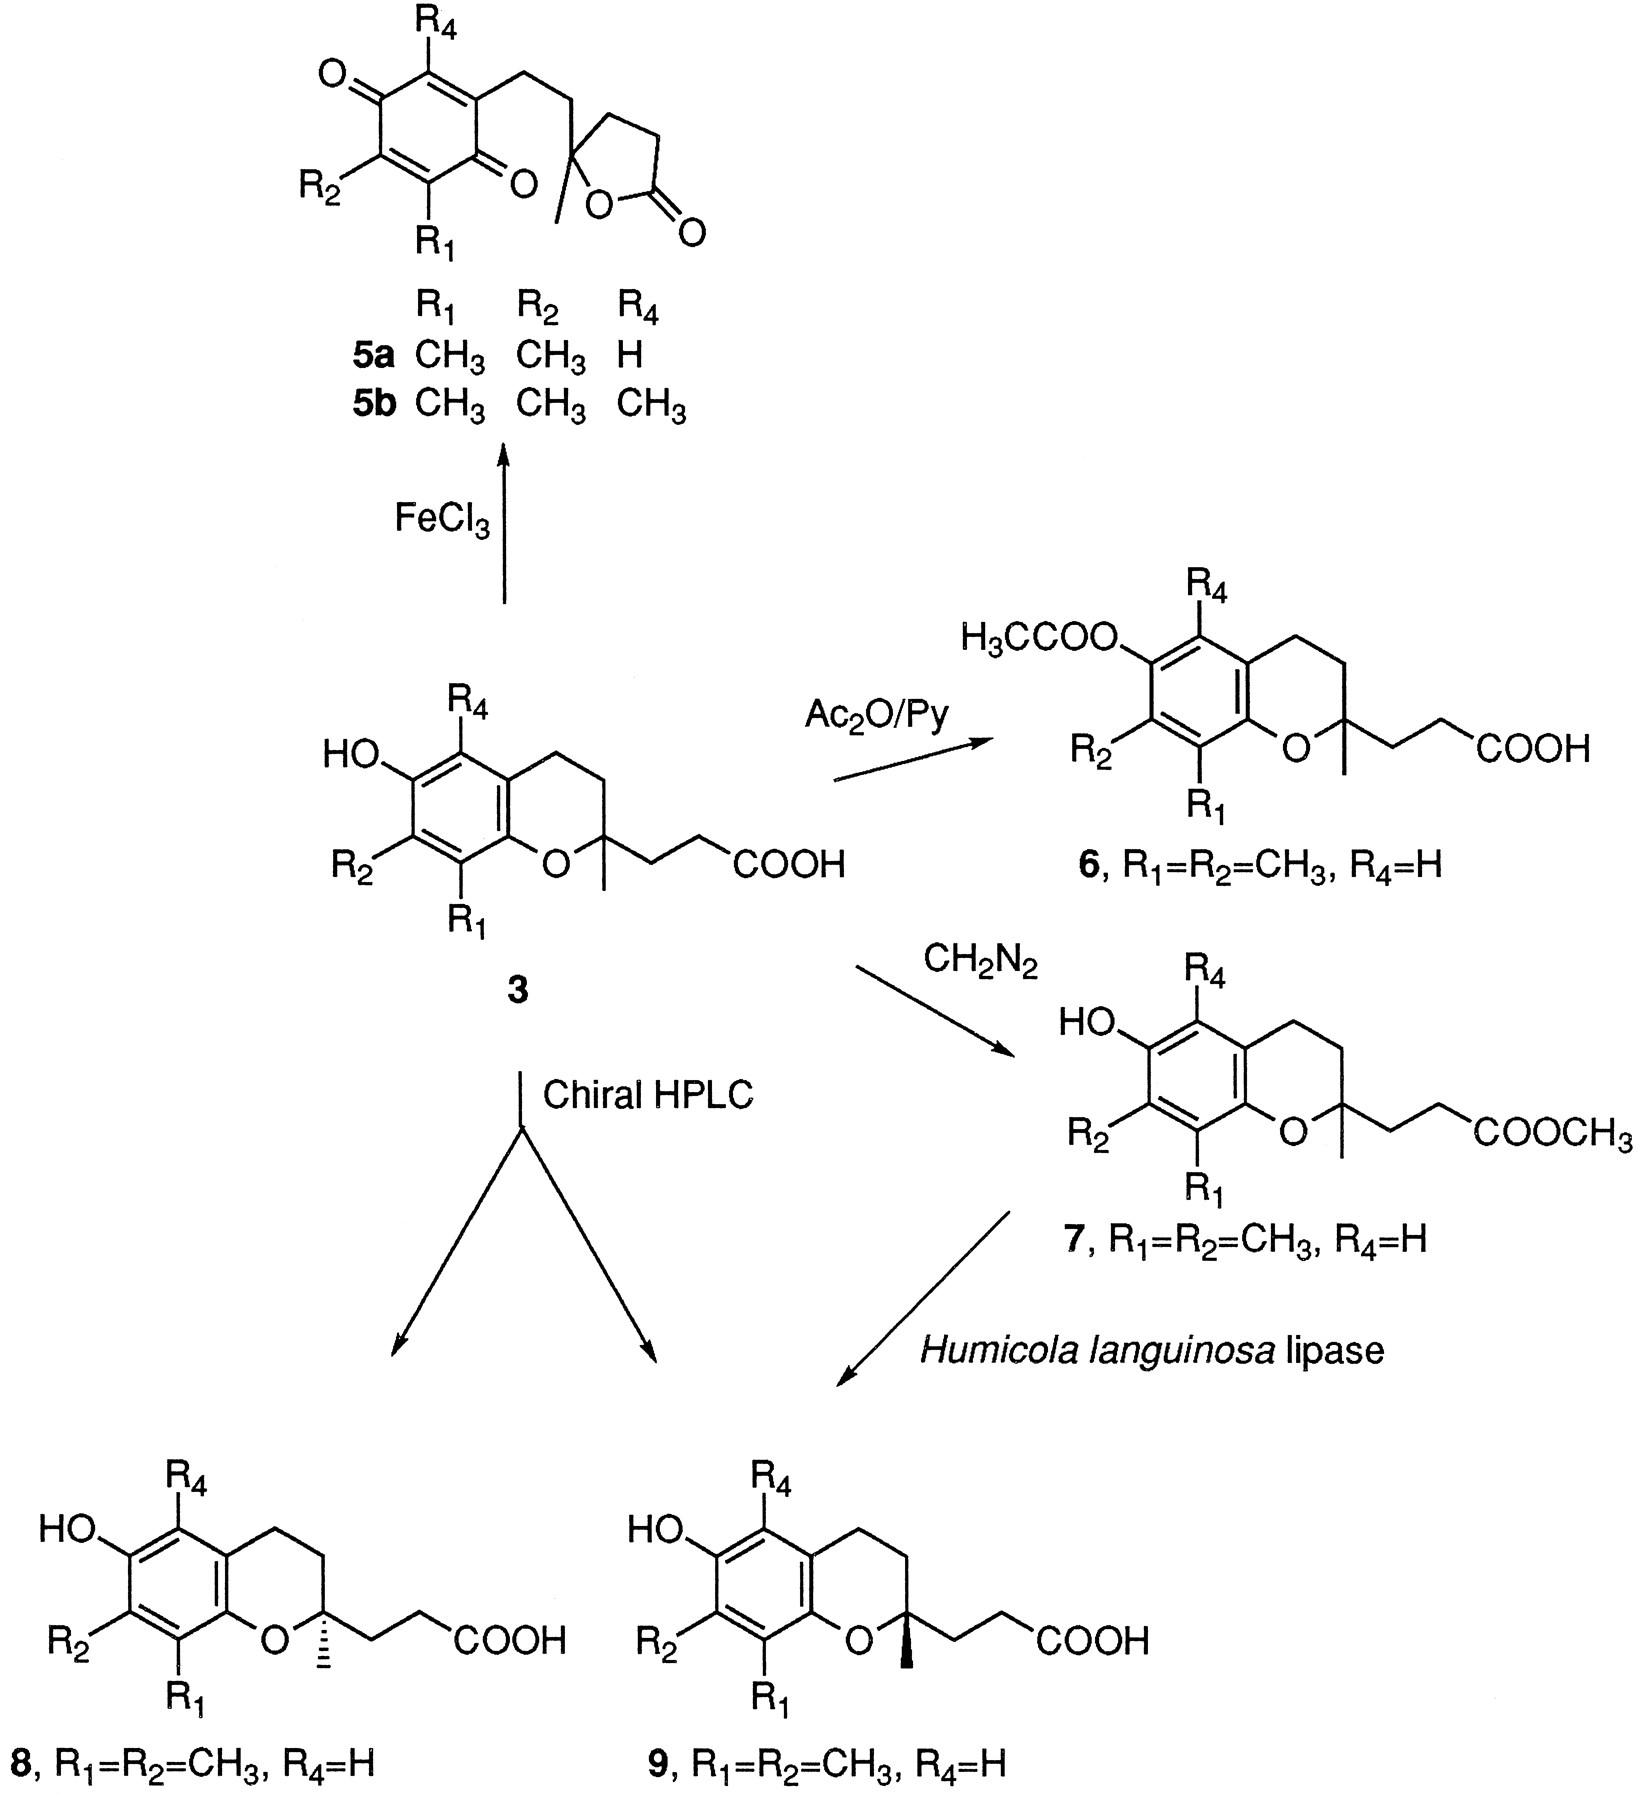 Endogenous Natriuretic Factors 6: The Stereochemistry of a